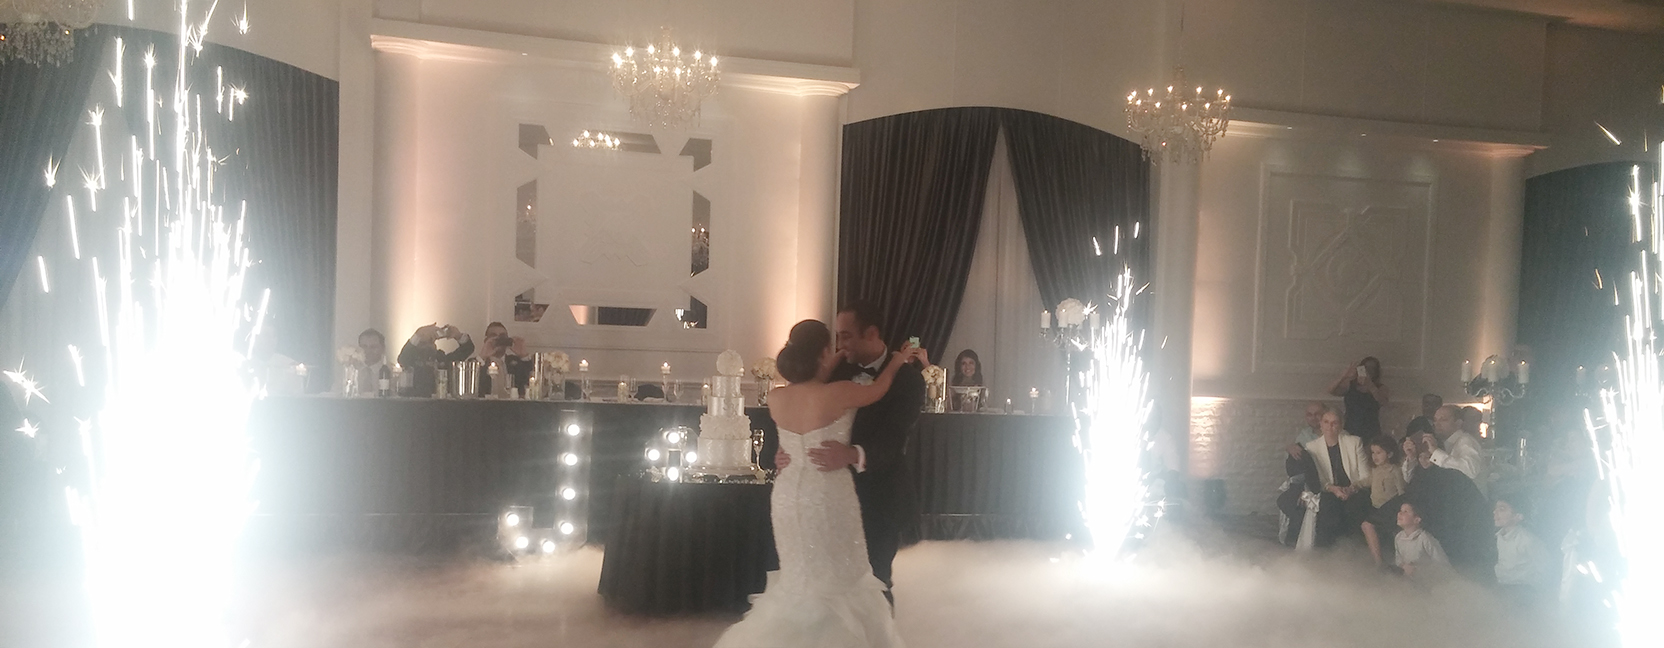 Blaso Pyrotechnics Wedding Fireworks John and Katrin 3.jpg